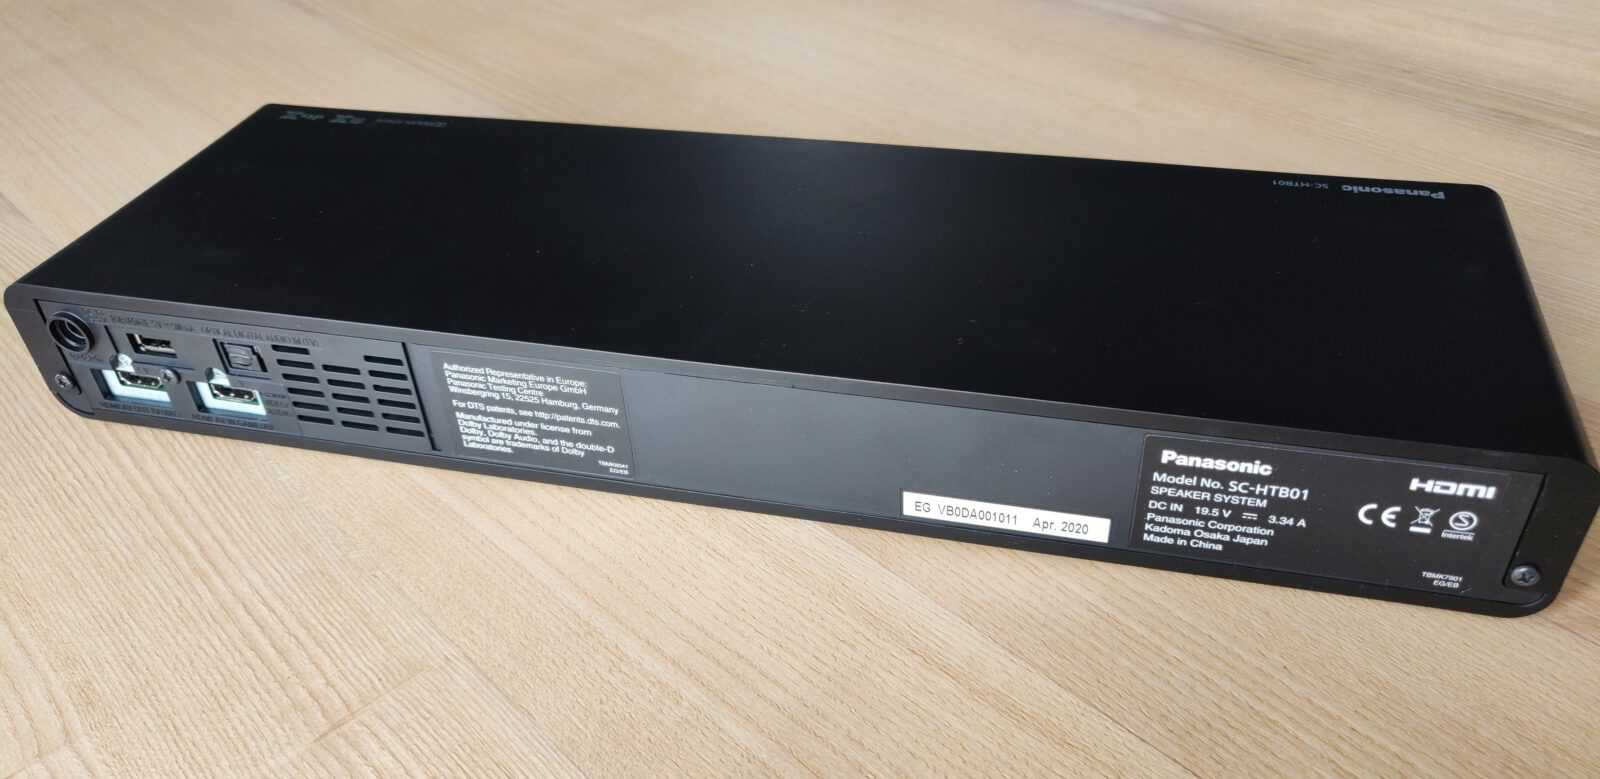 Panasonic Soundslayer Gaming Speaker Barre De Son (sc Htb01) 01 01